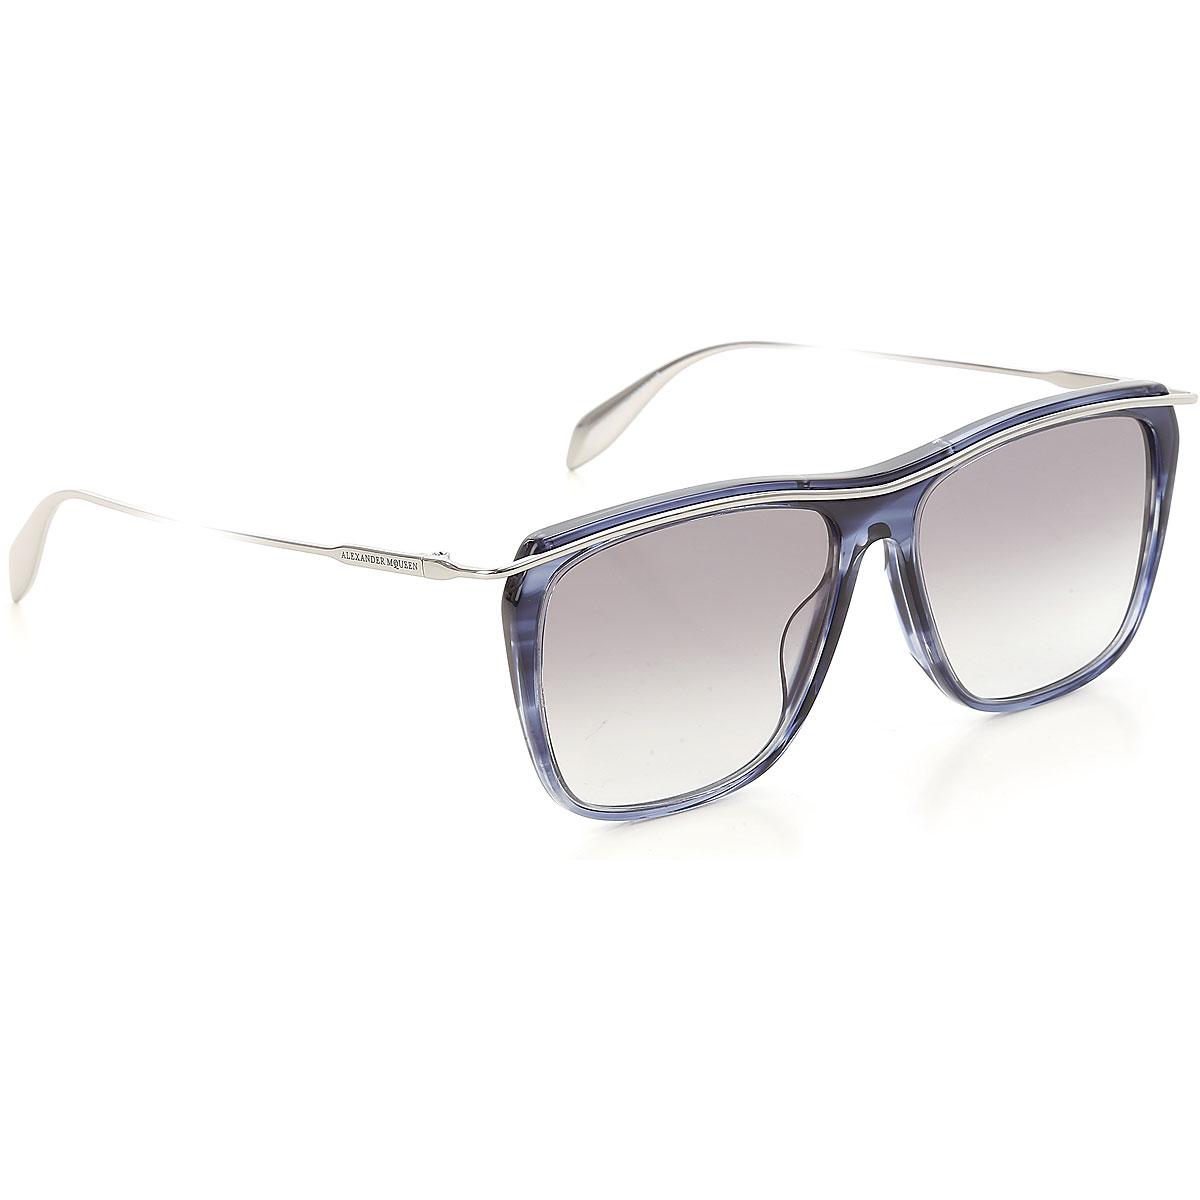 Alexander McQueen Sunglasses On Sale, Blue, 2019